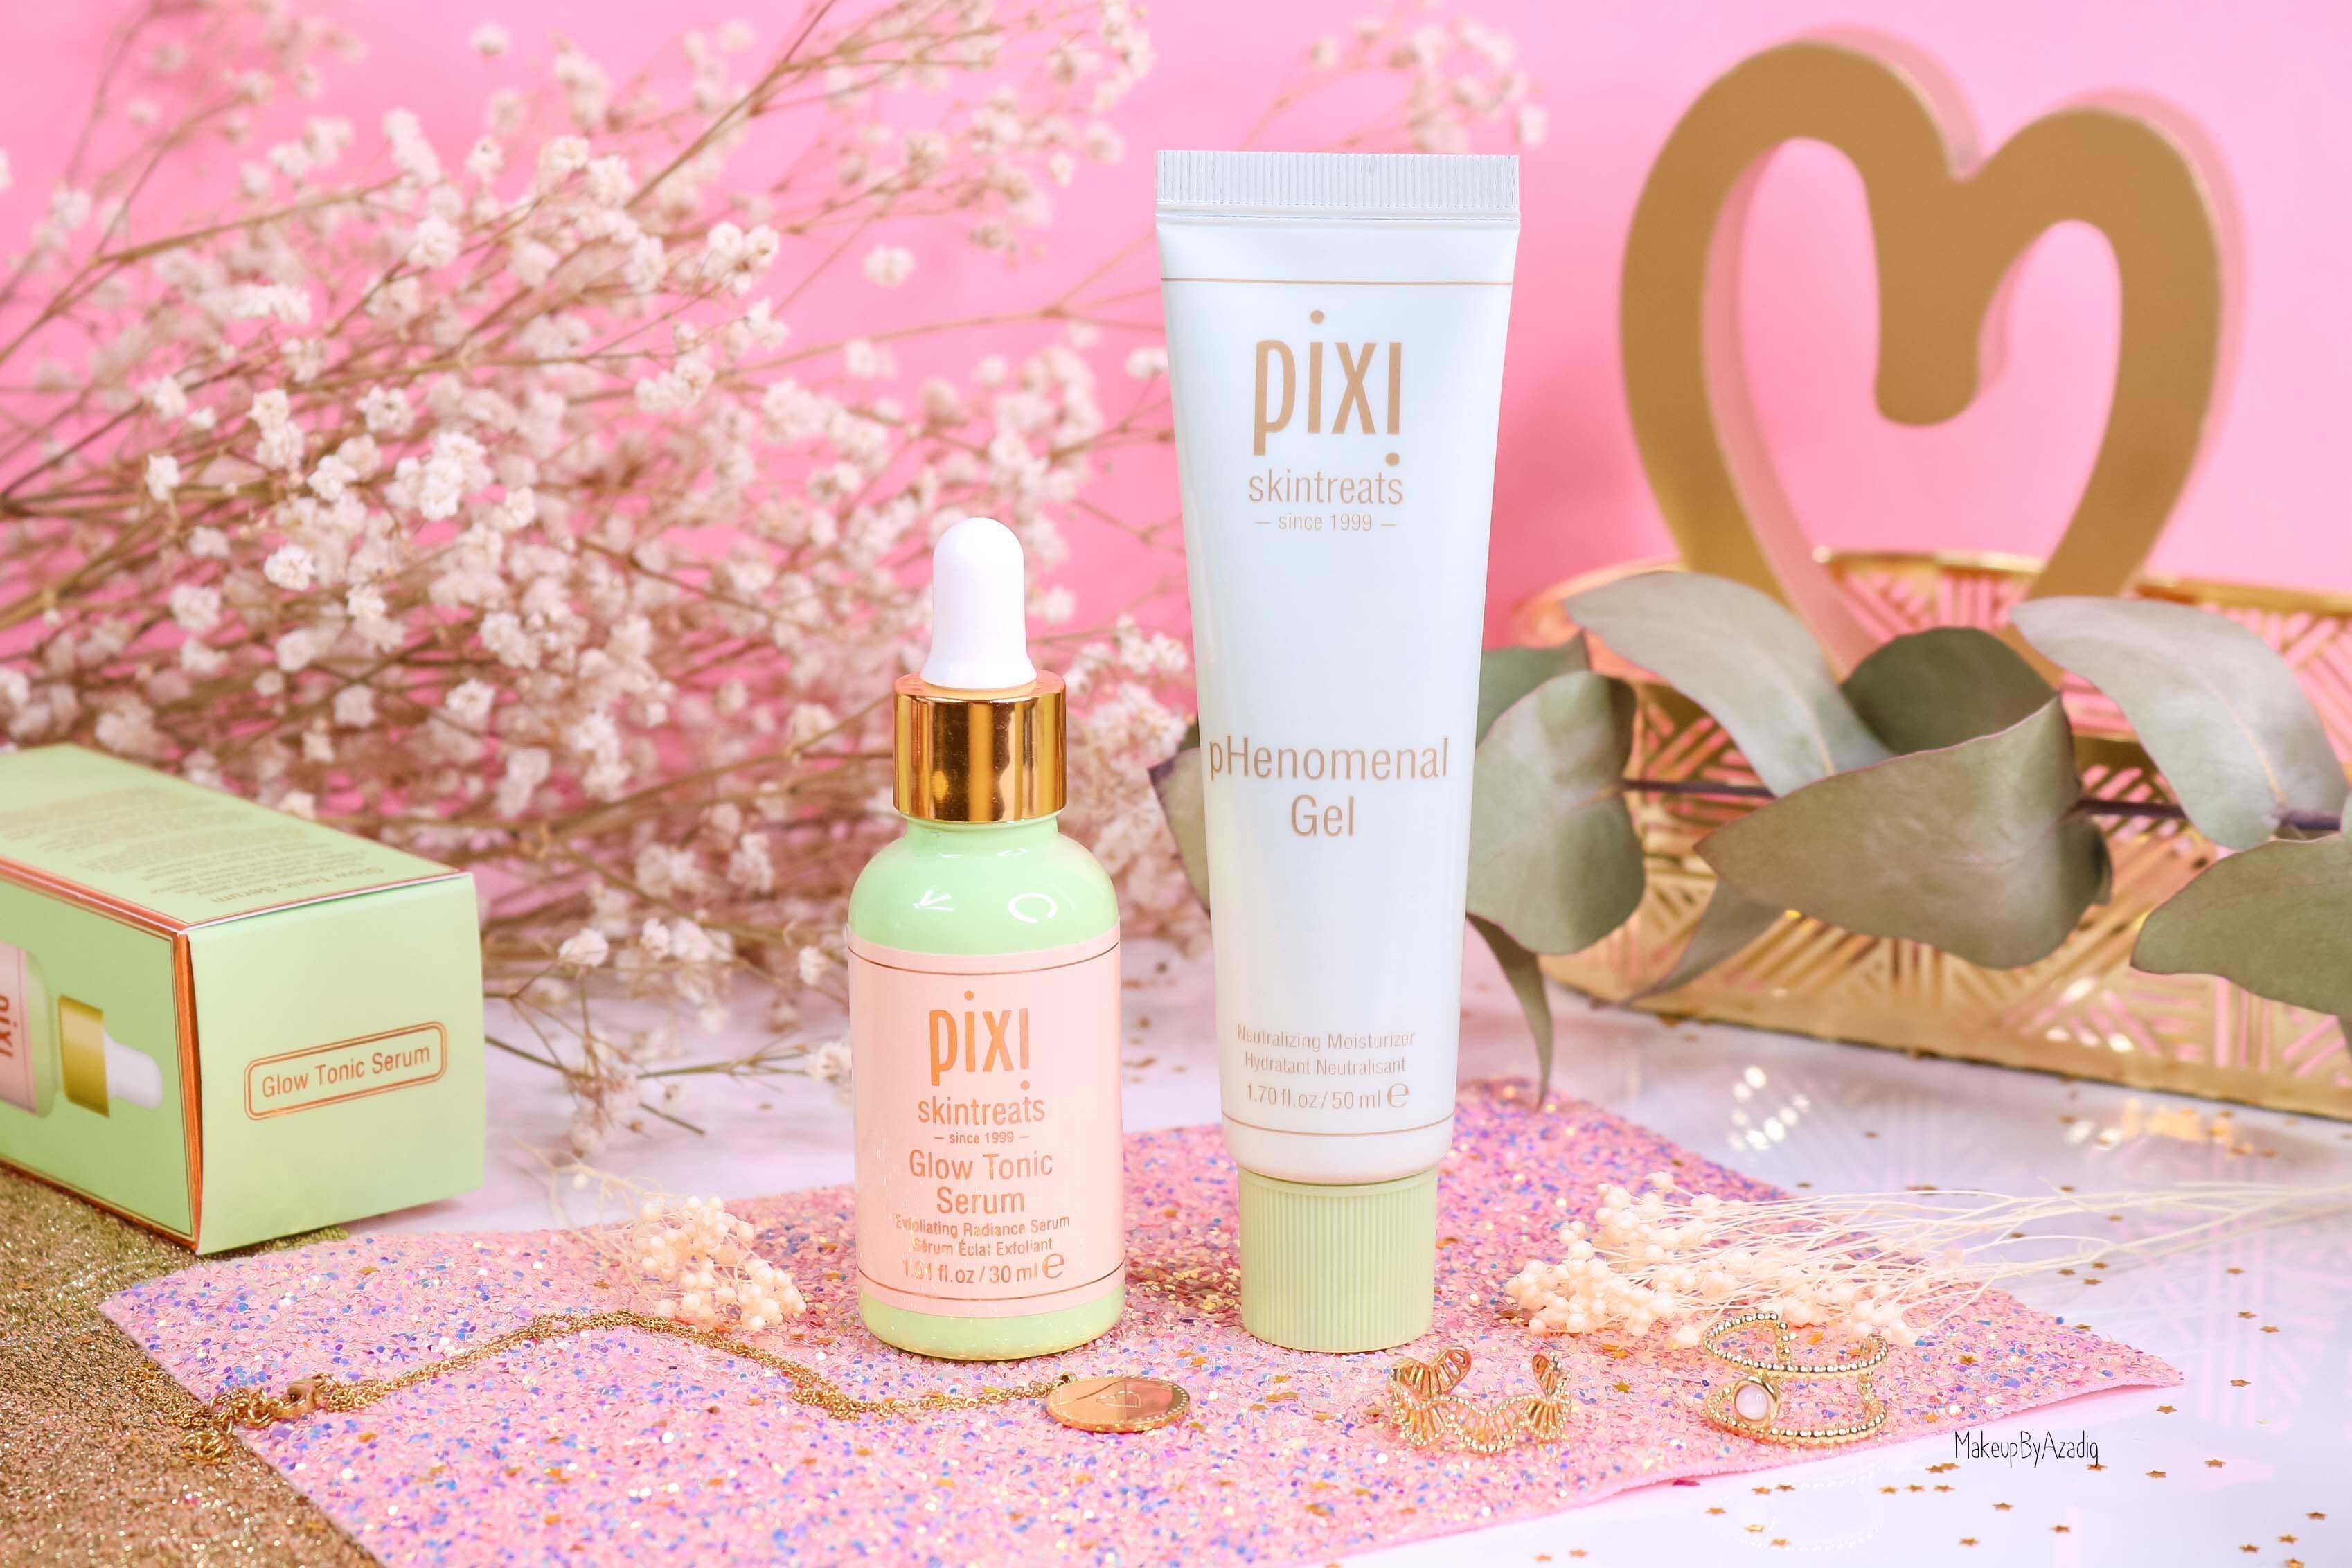 revue-routine-soin-skincare-pixi-beauty-visage-glow-tonic-serum-phenomenal-gel-aloe-vera-makeupbyazadig-sephora-avis-prix-best